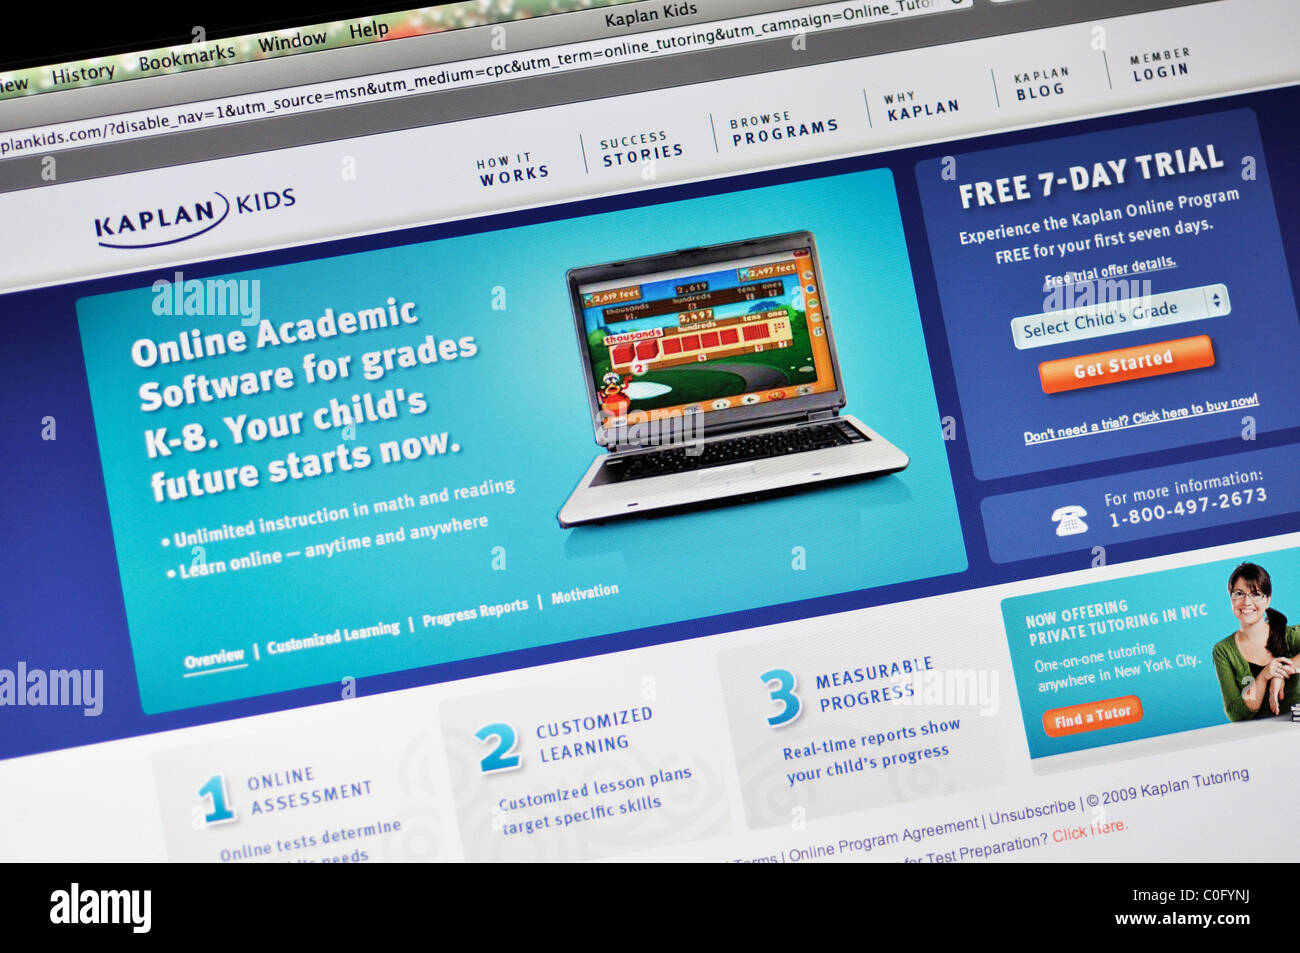 Kaplan education website - Stock Image